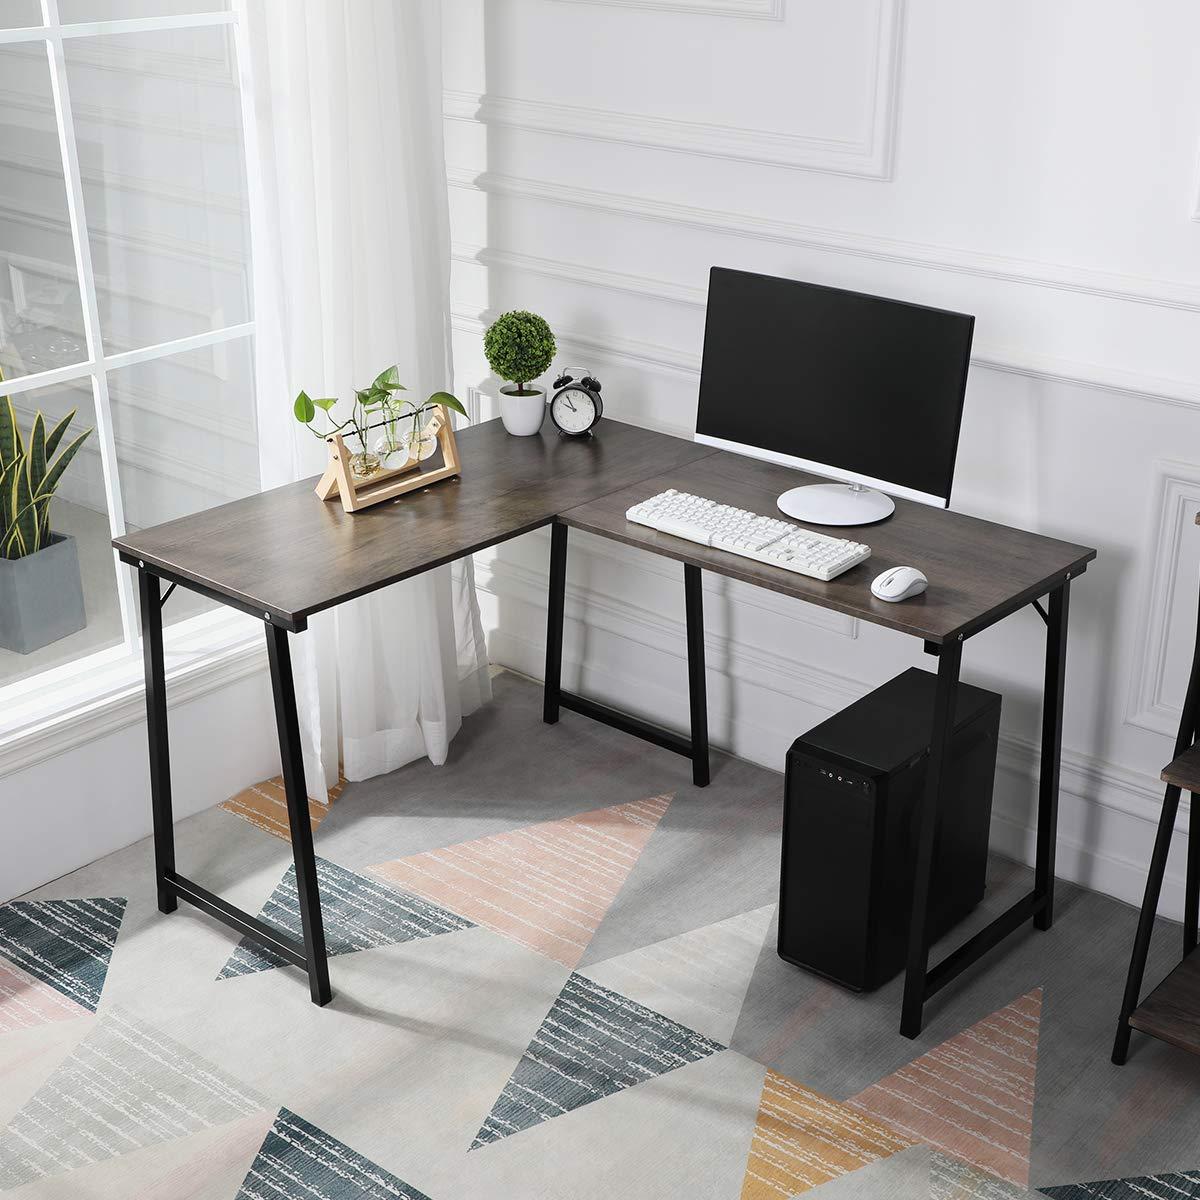 GreenForest Corner Desk L Shaped Computer Desk PC Latop Table Workstation for Home Office, Walnut by GreenForest (Image #2)